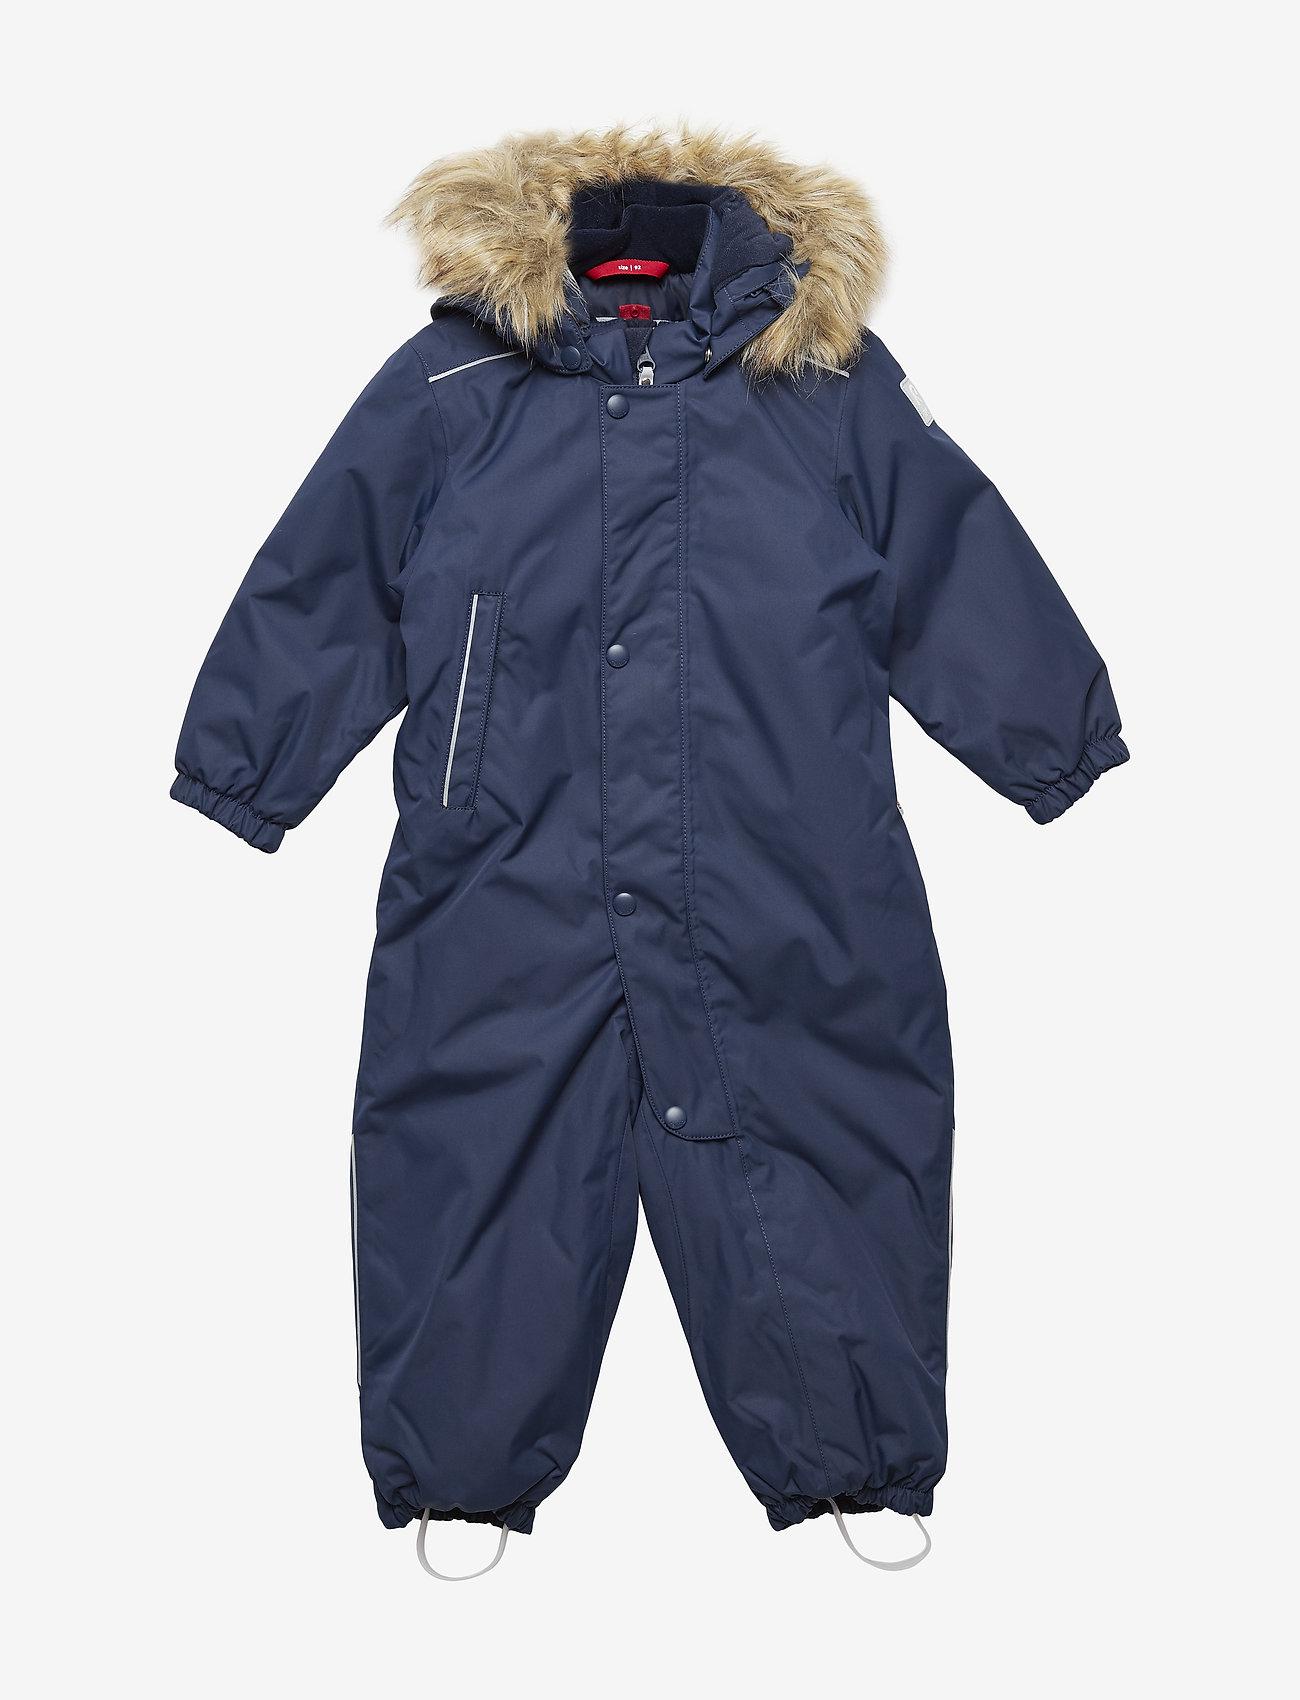 Reima - Reimatec winter overall, Gotland Dark berry,80 cm - snowsuit - navy - 0